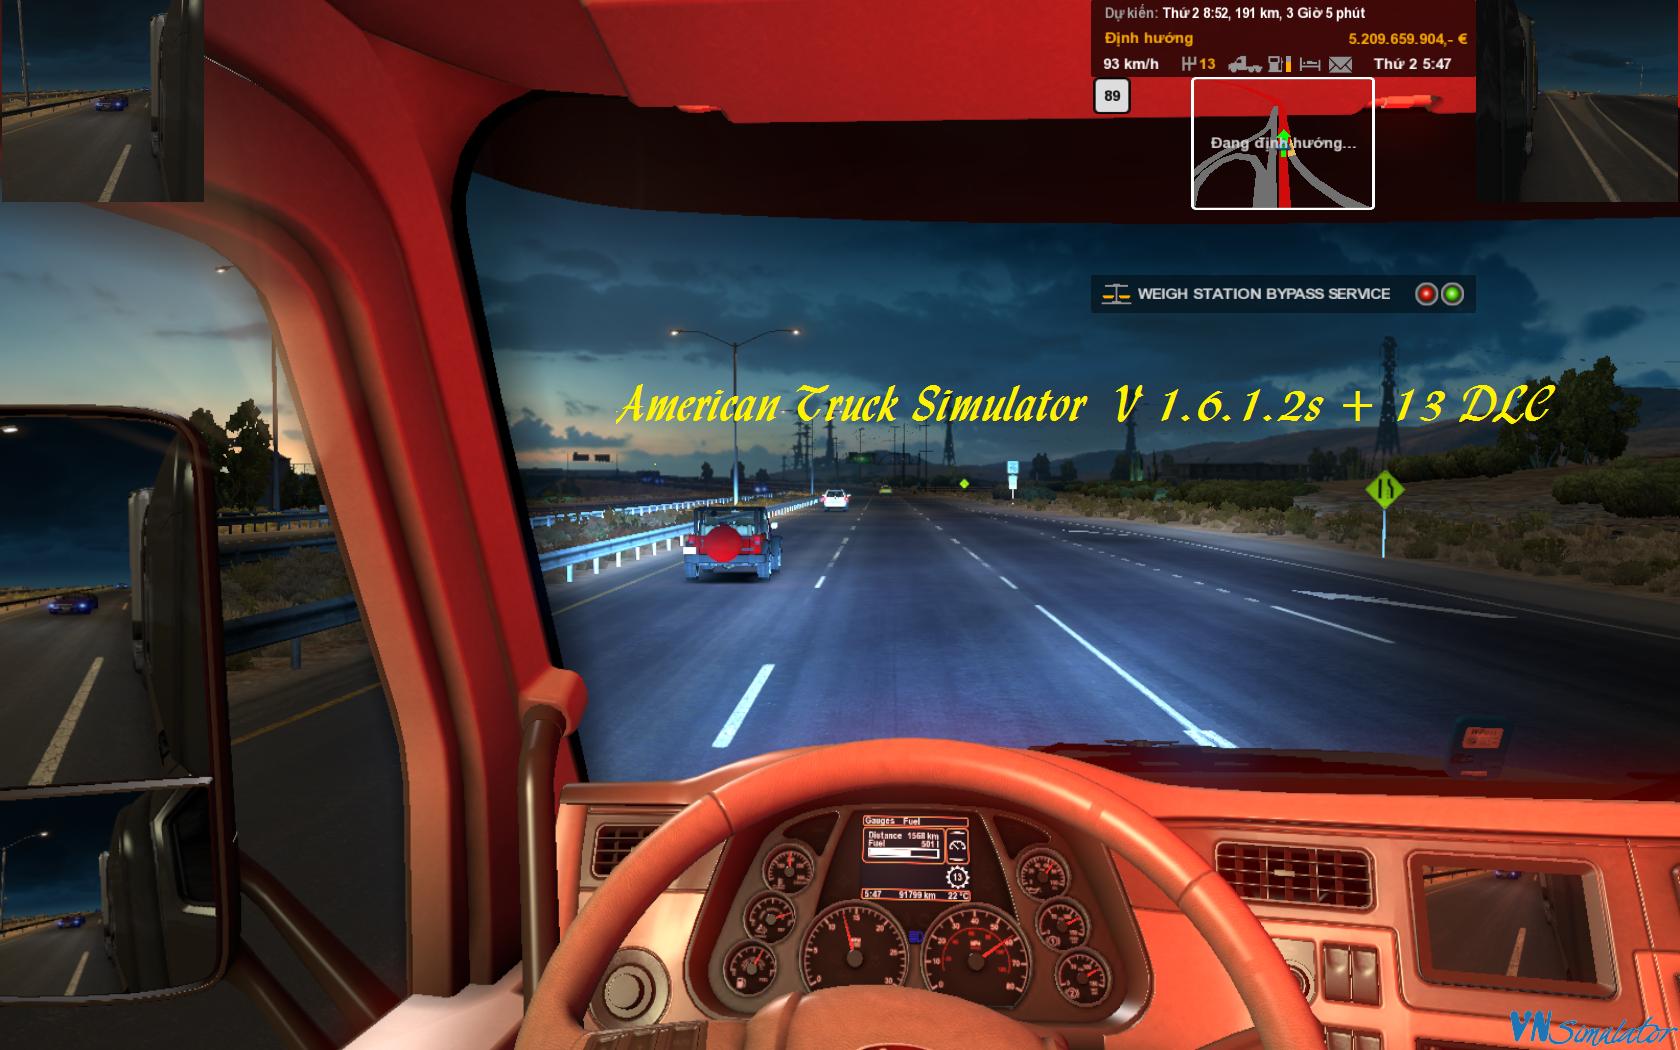 1 6 x - American Truck Simulator V 1 6 1 2s + 13 DLC rar